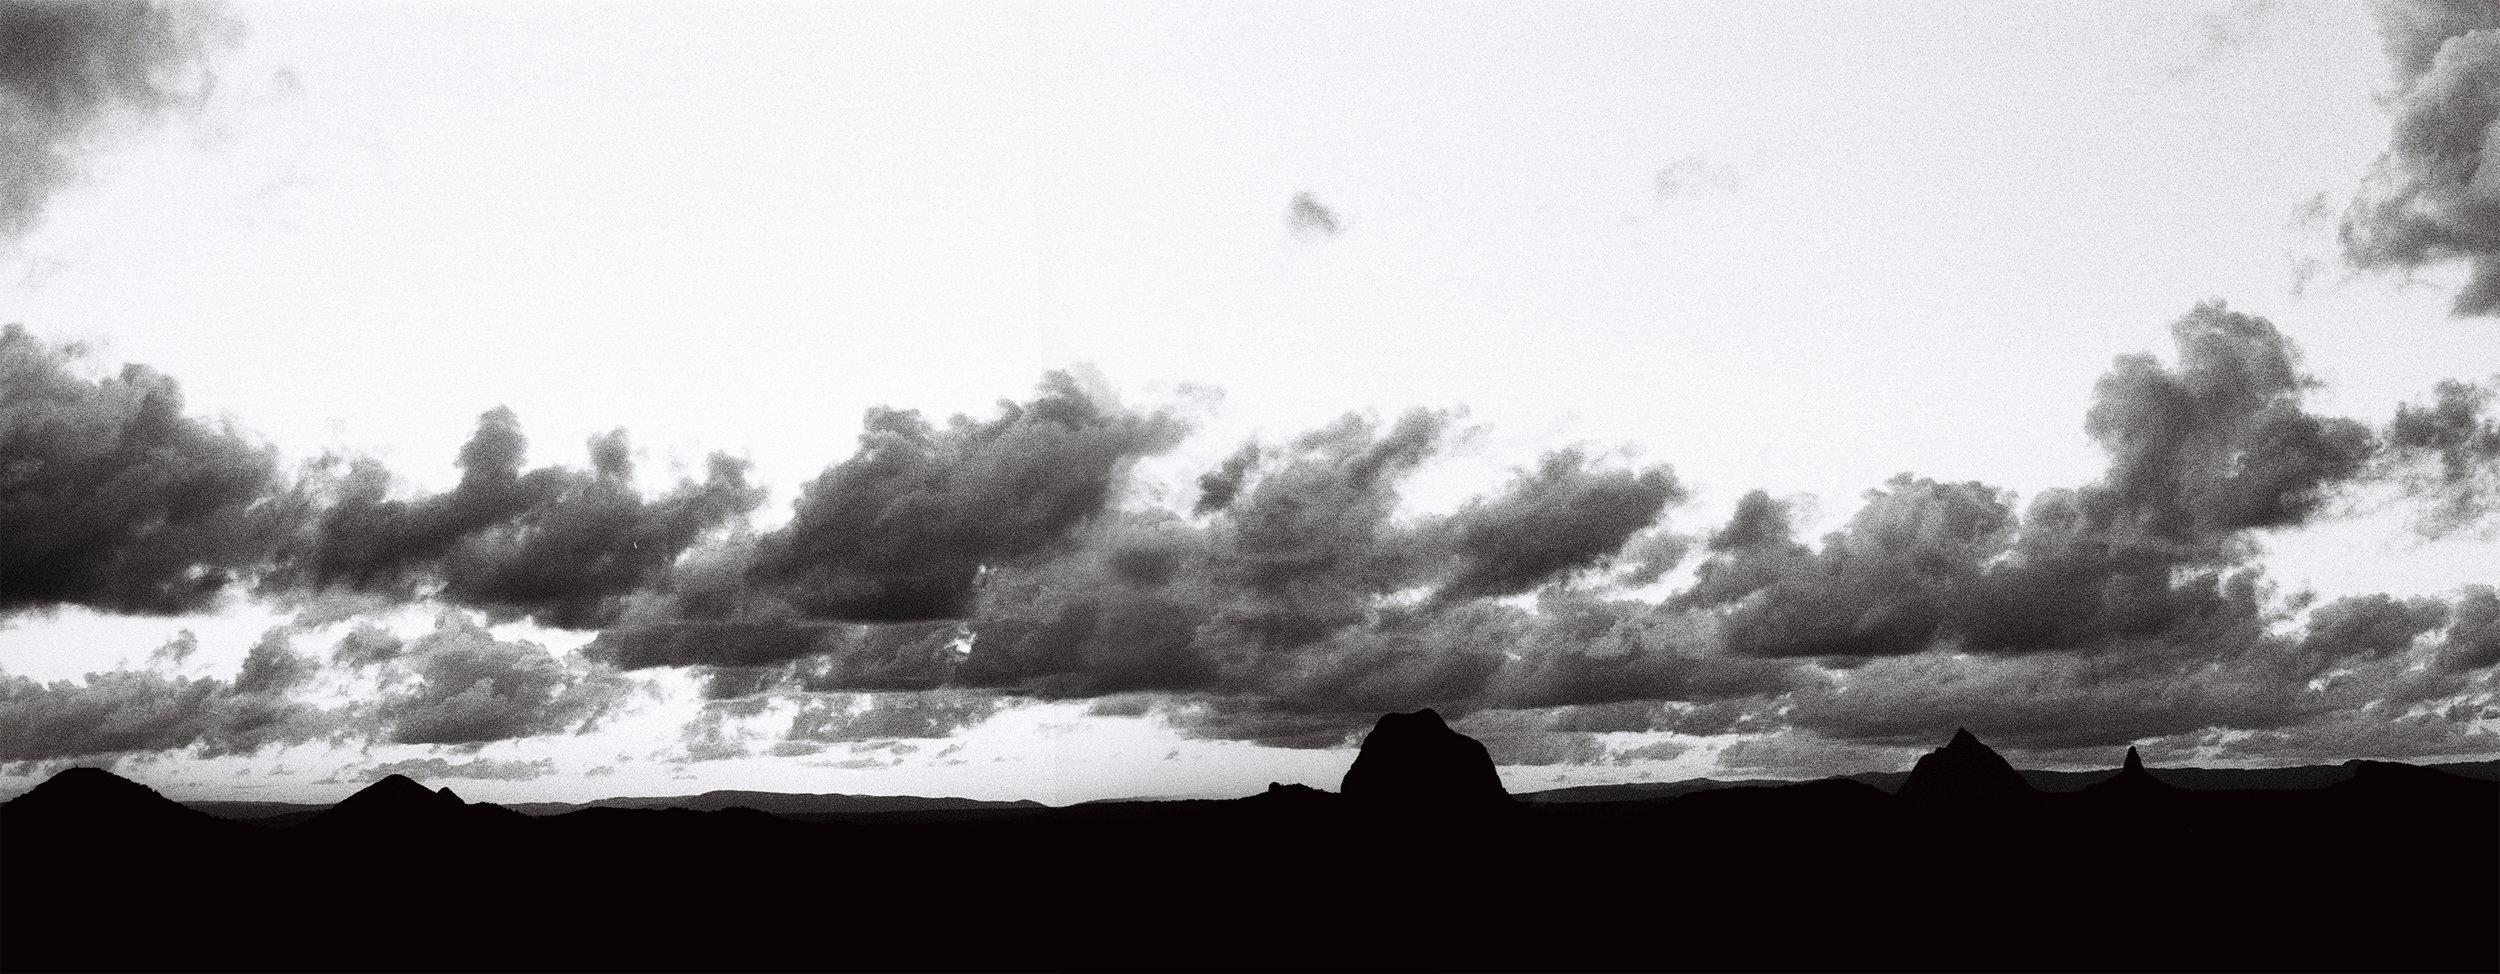 Glasshouse Mountains, from Glasshouse Mountains Lookout. Sunshine Coast, Qld Australia